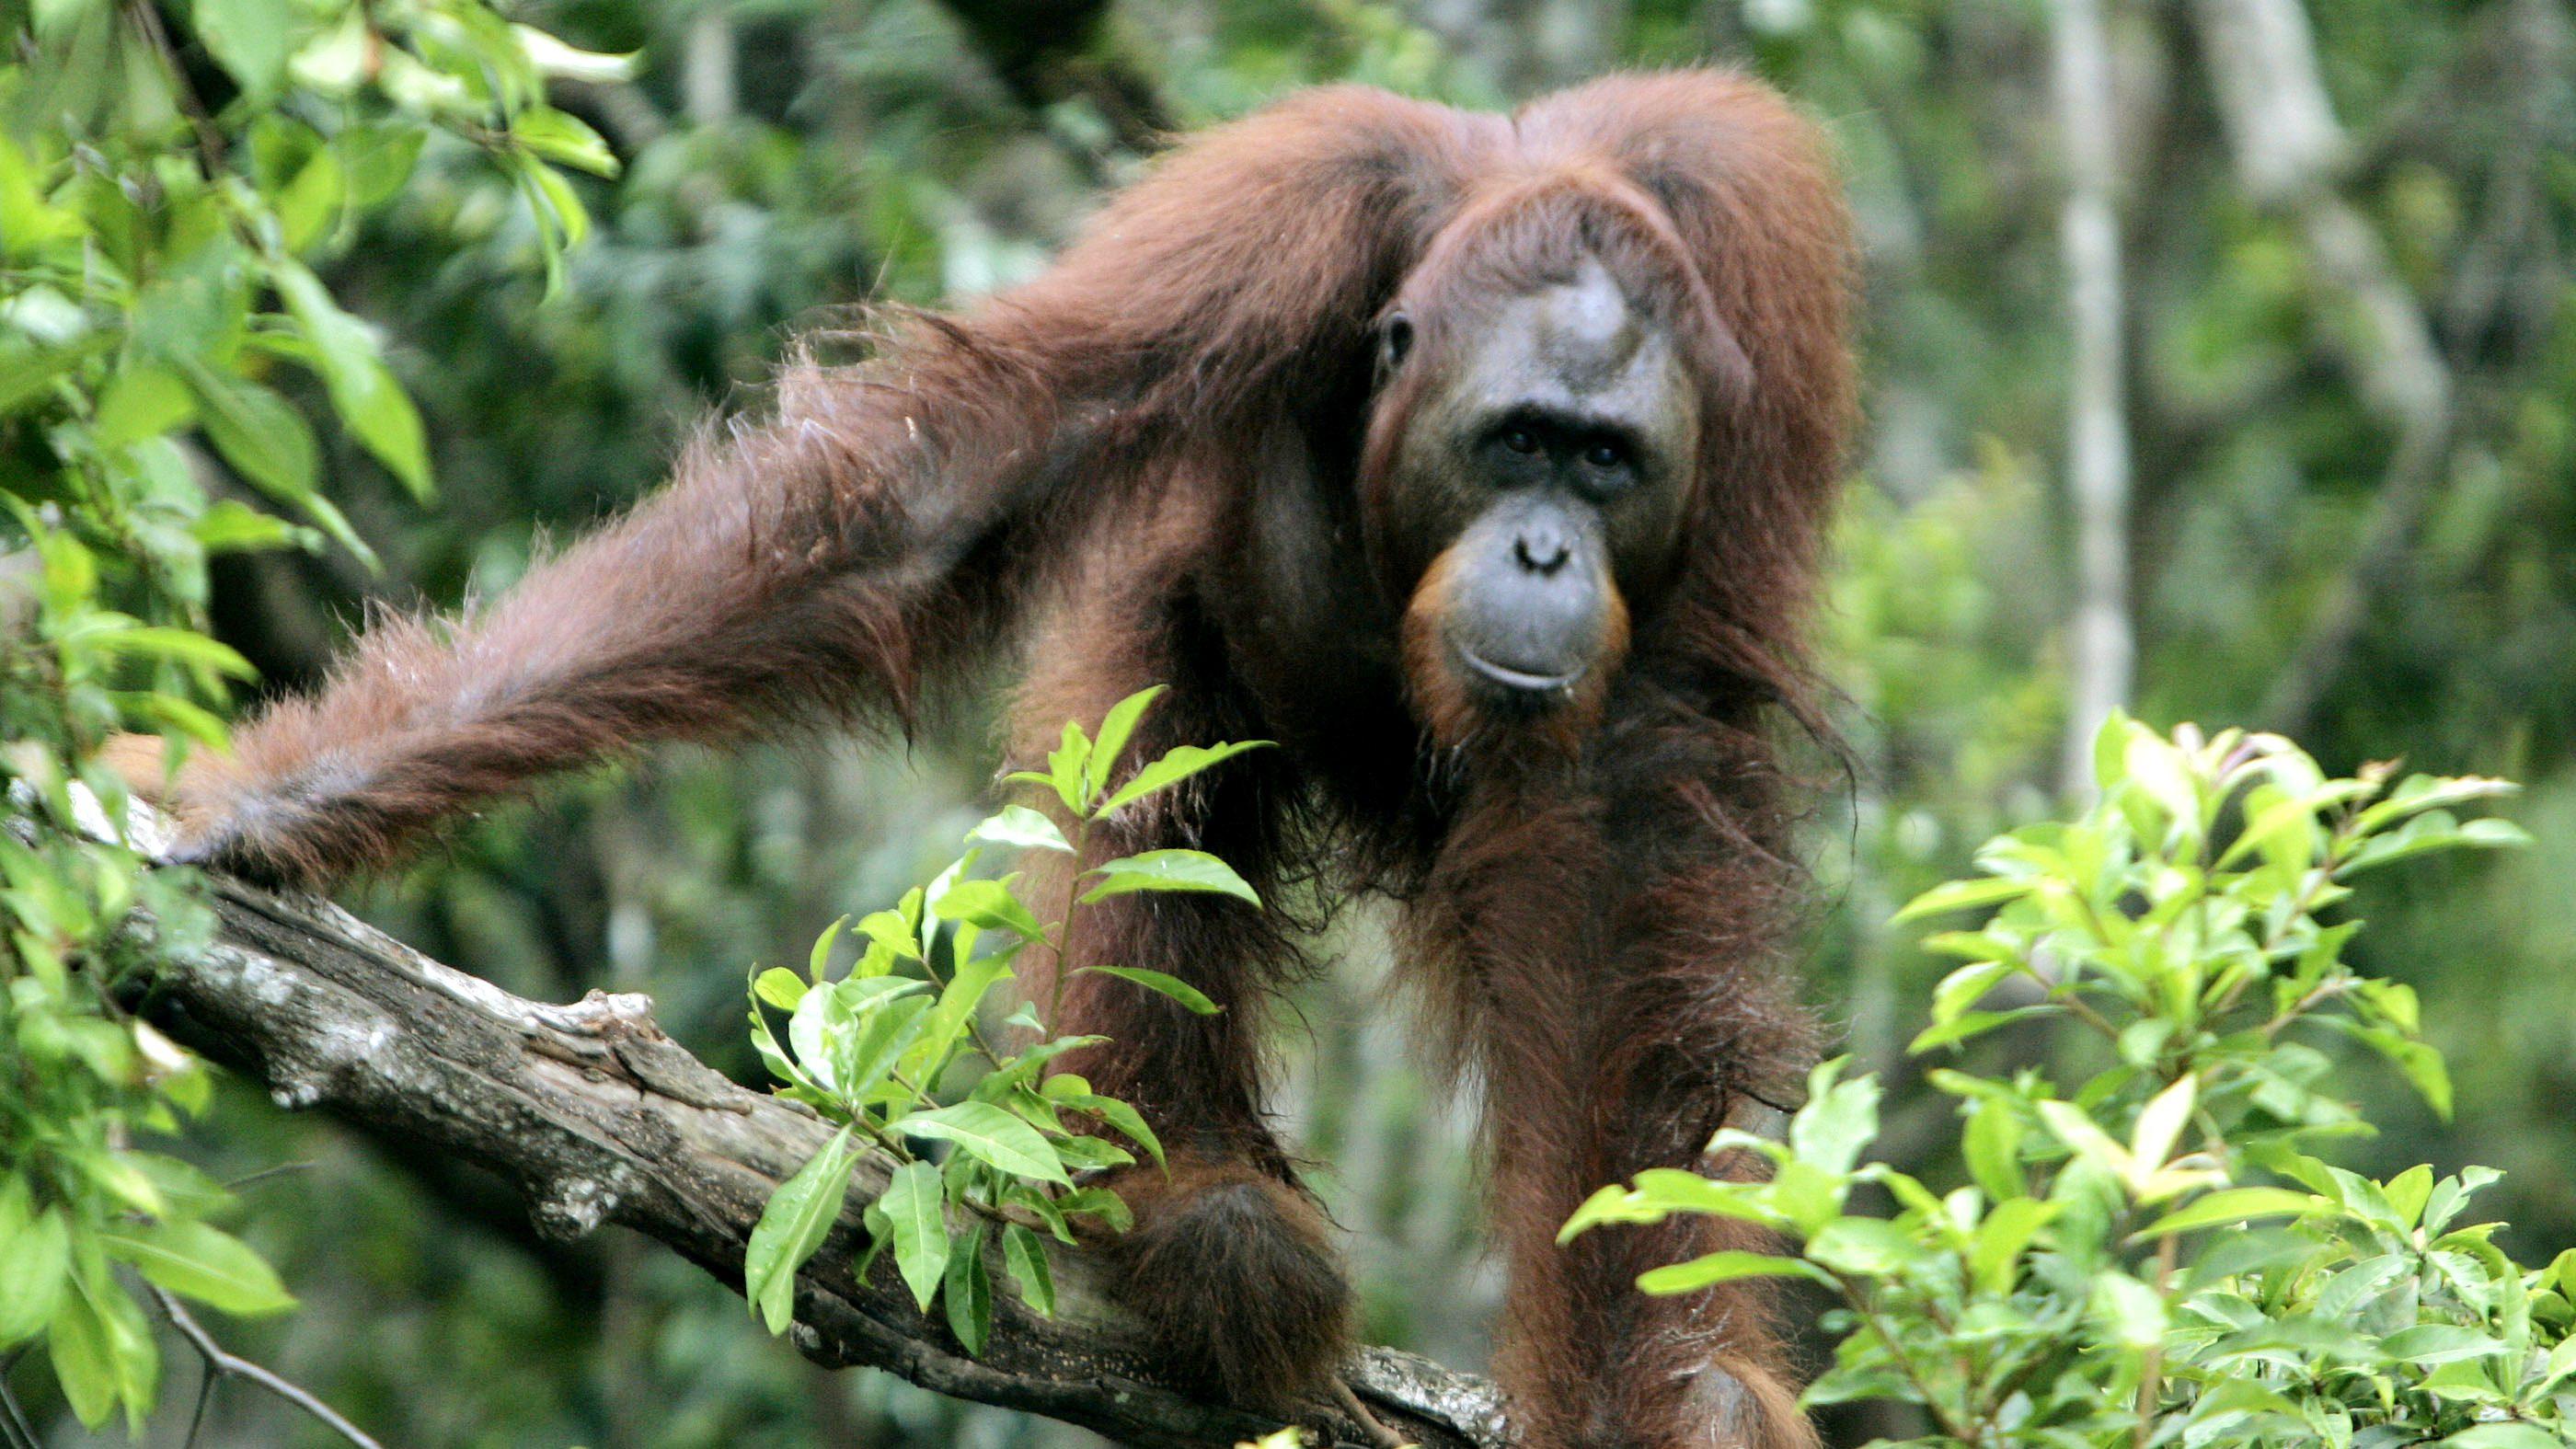 An orangutan in Indonesia